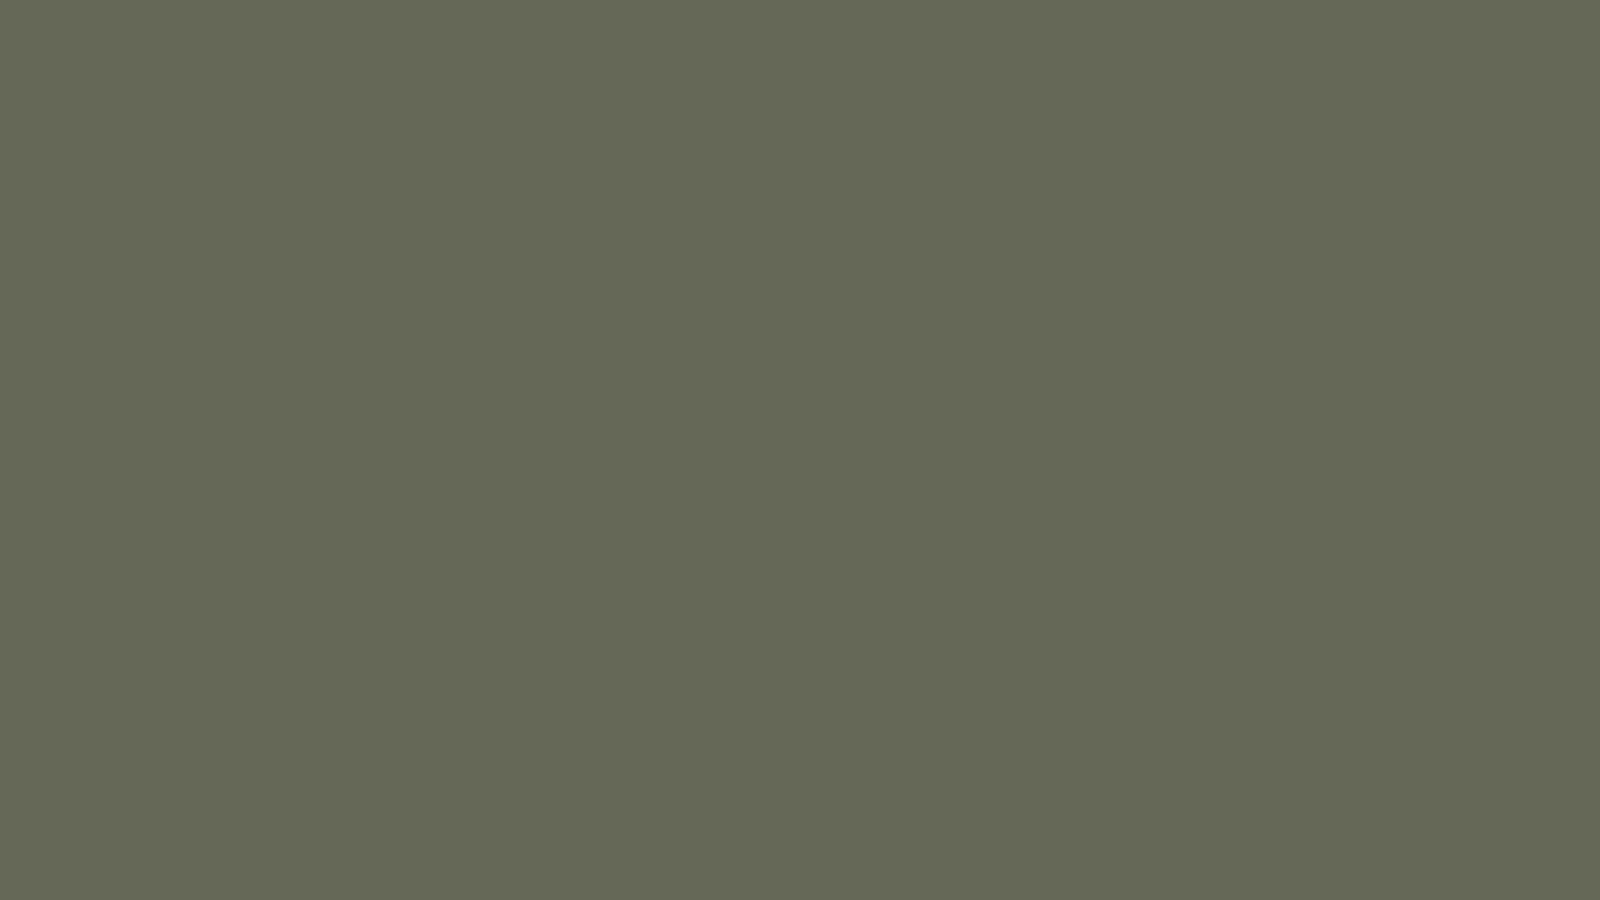 Плита ДСП Акрил 055 Cammello 2800х1300х18.8, 2-сторонн. (верблюжий)